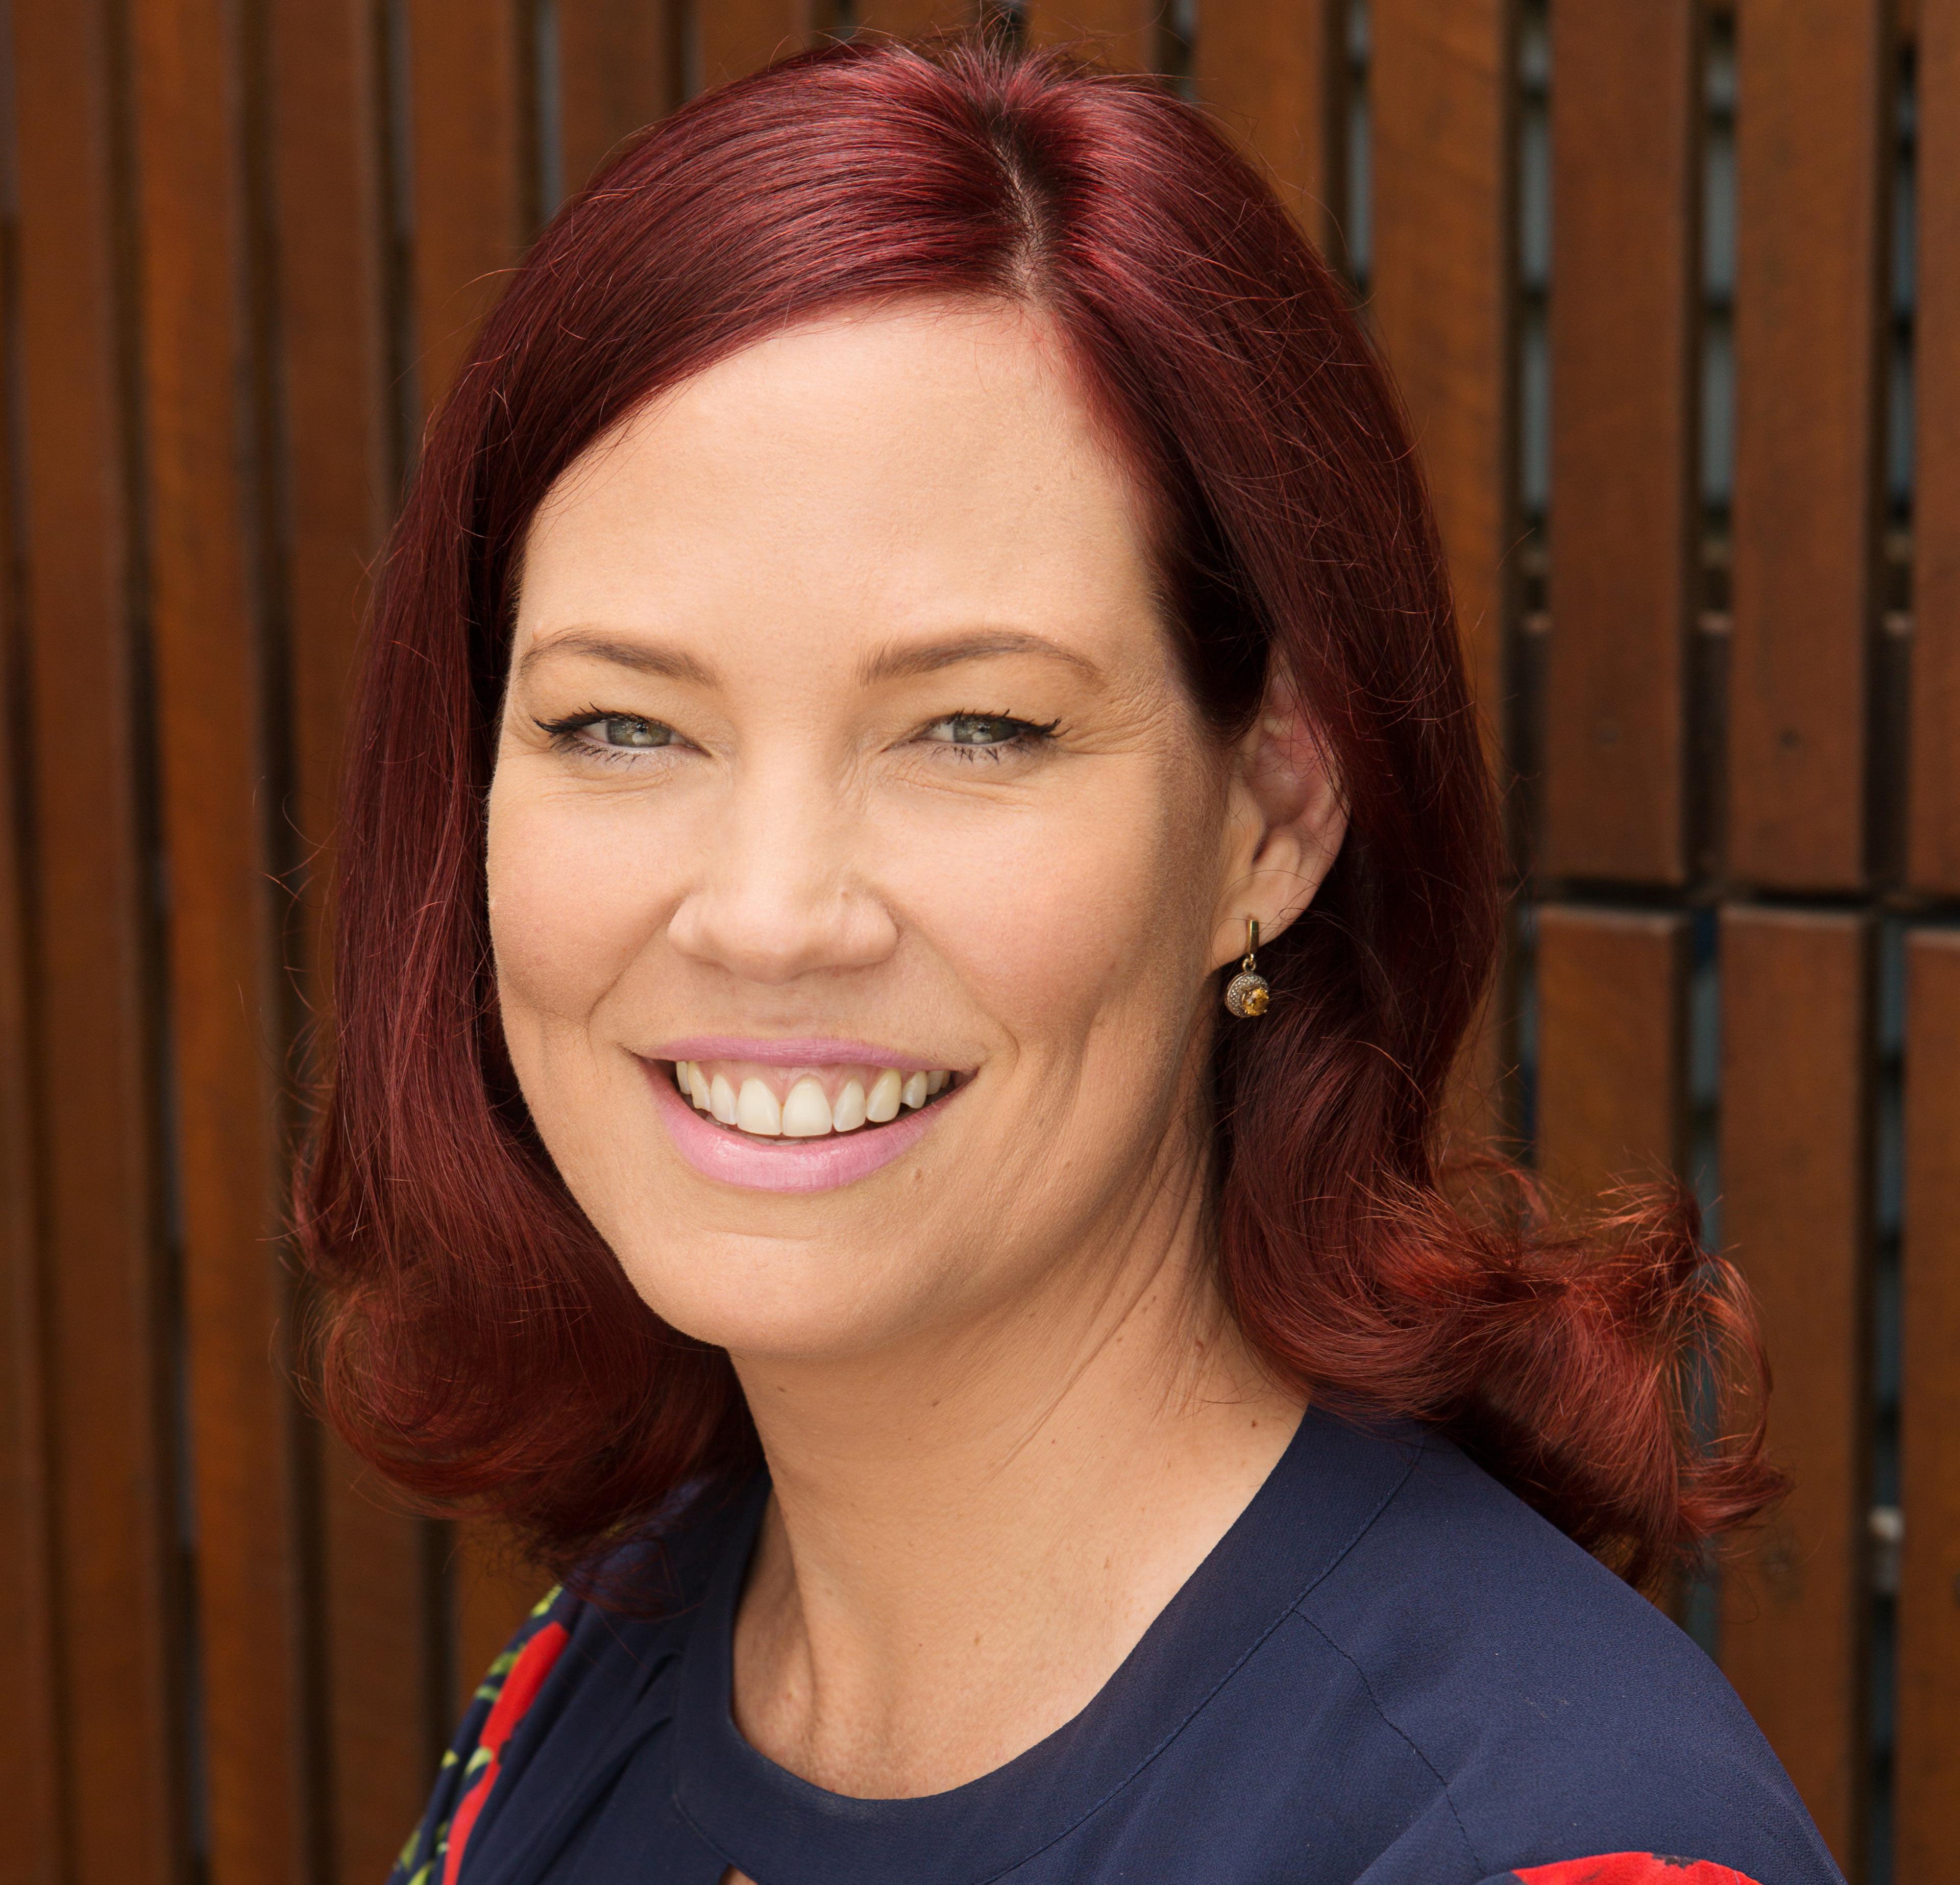 Dr Hayley Linthwaite